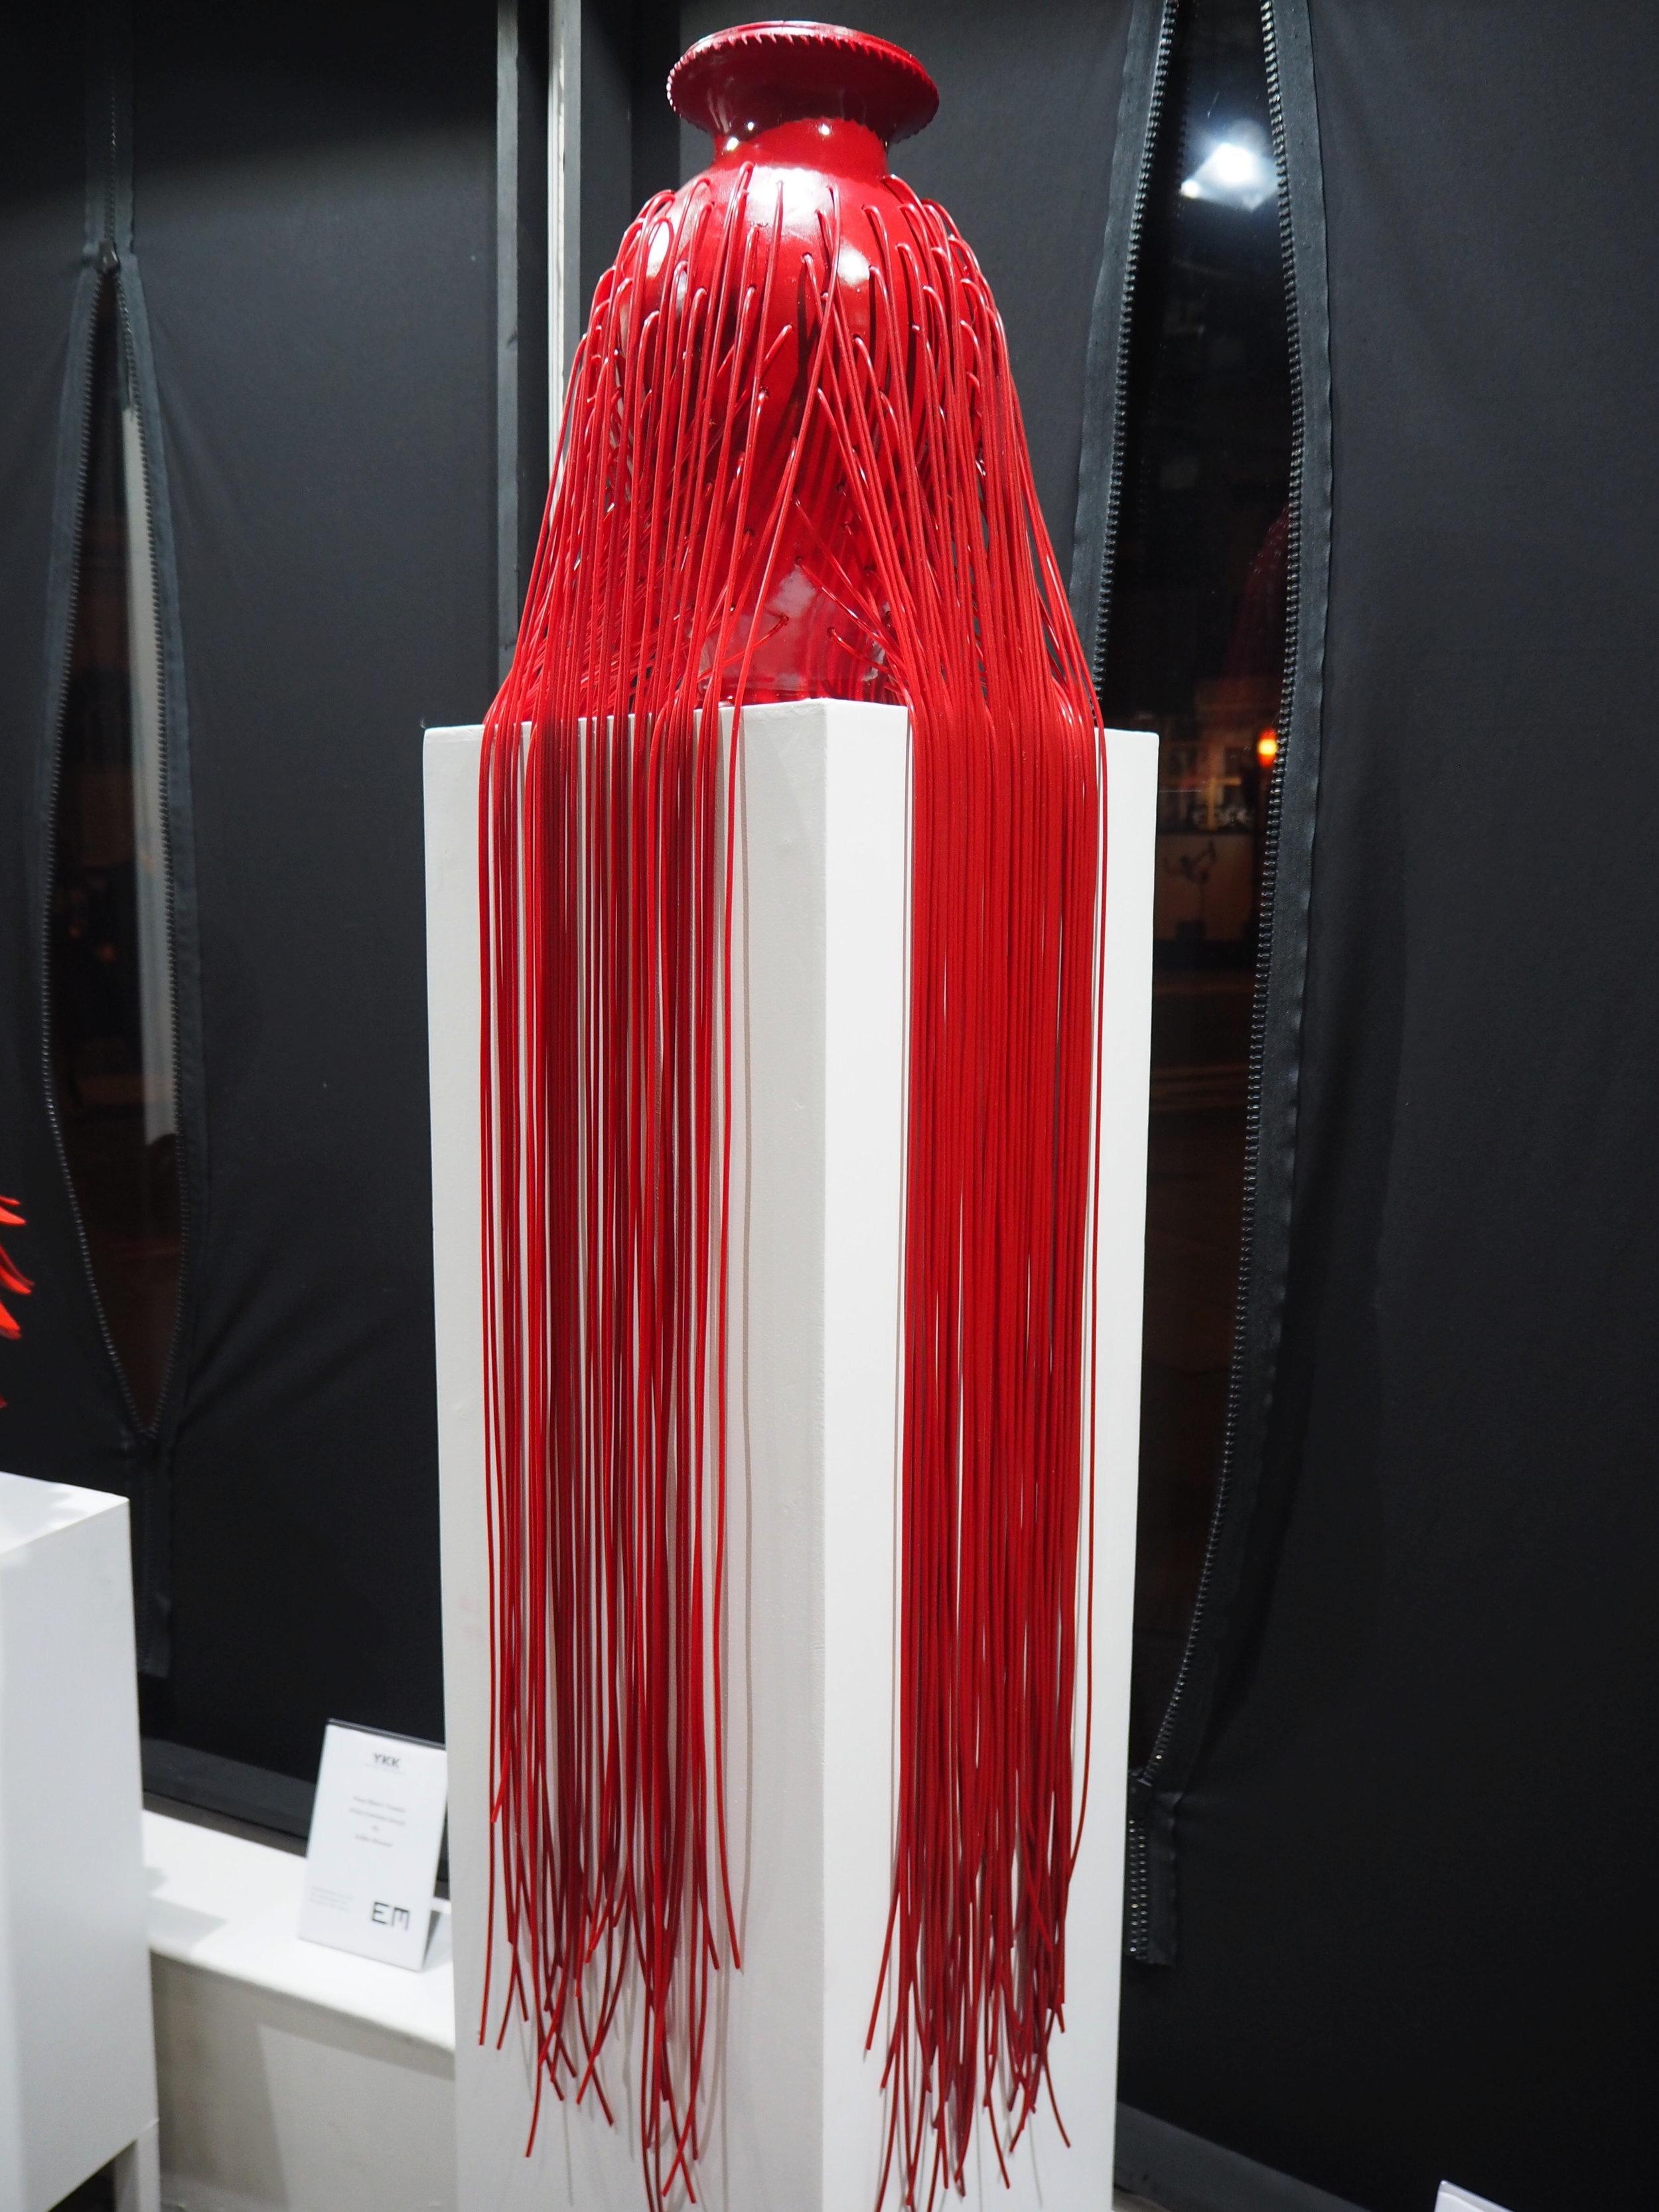 eelko-moorer-lamp.JPG